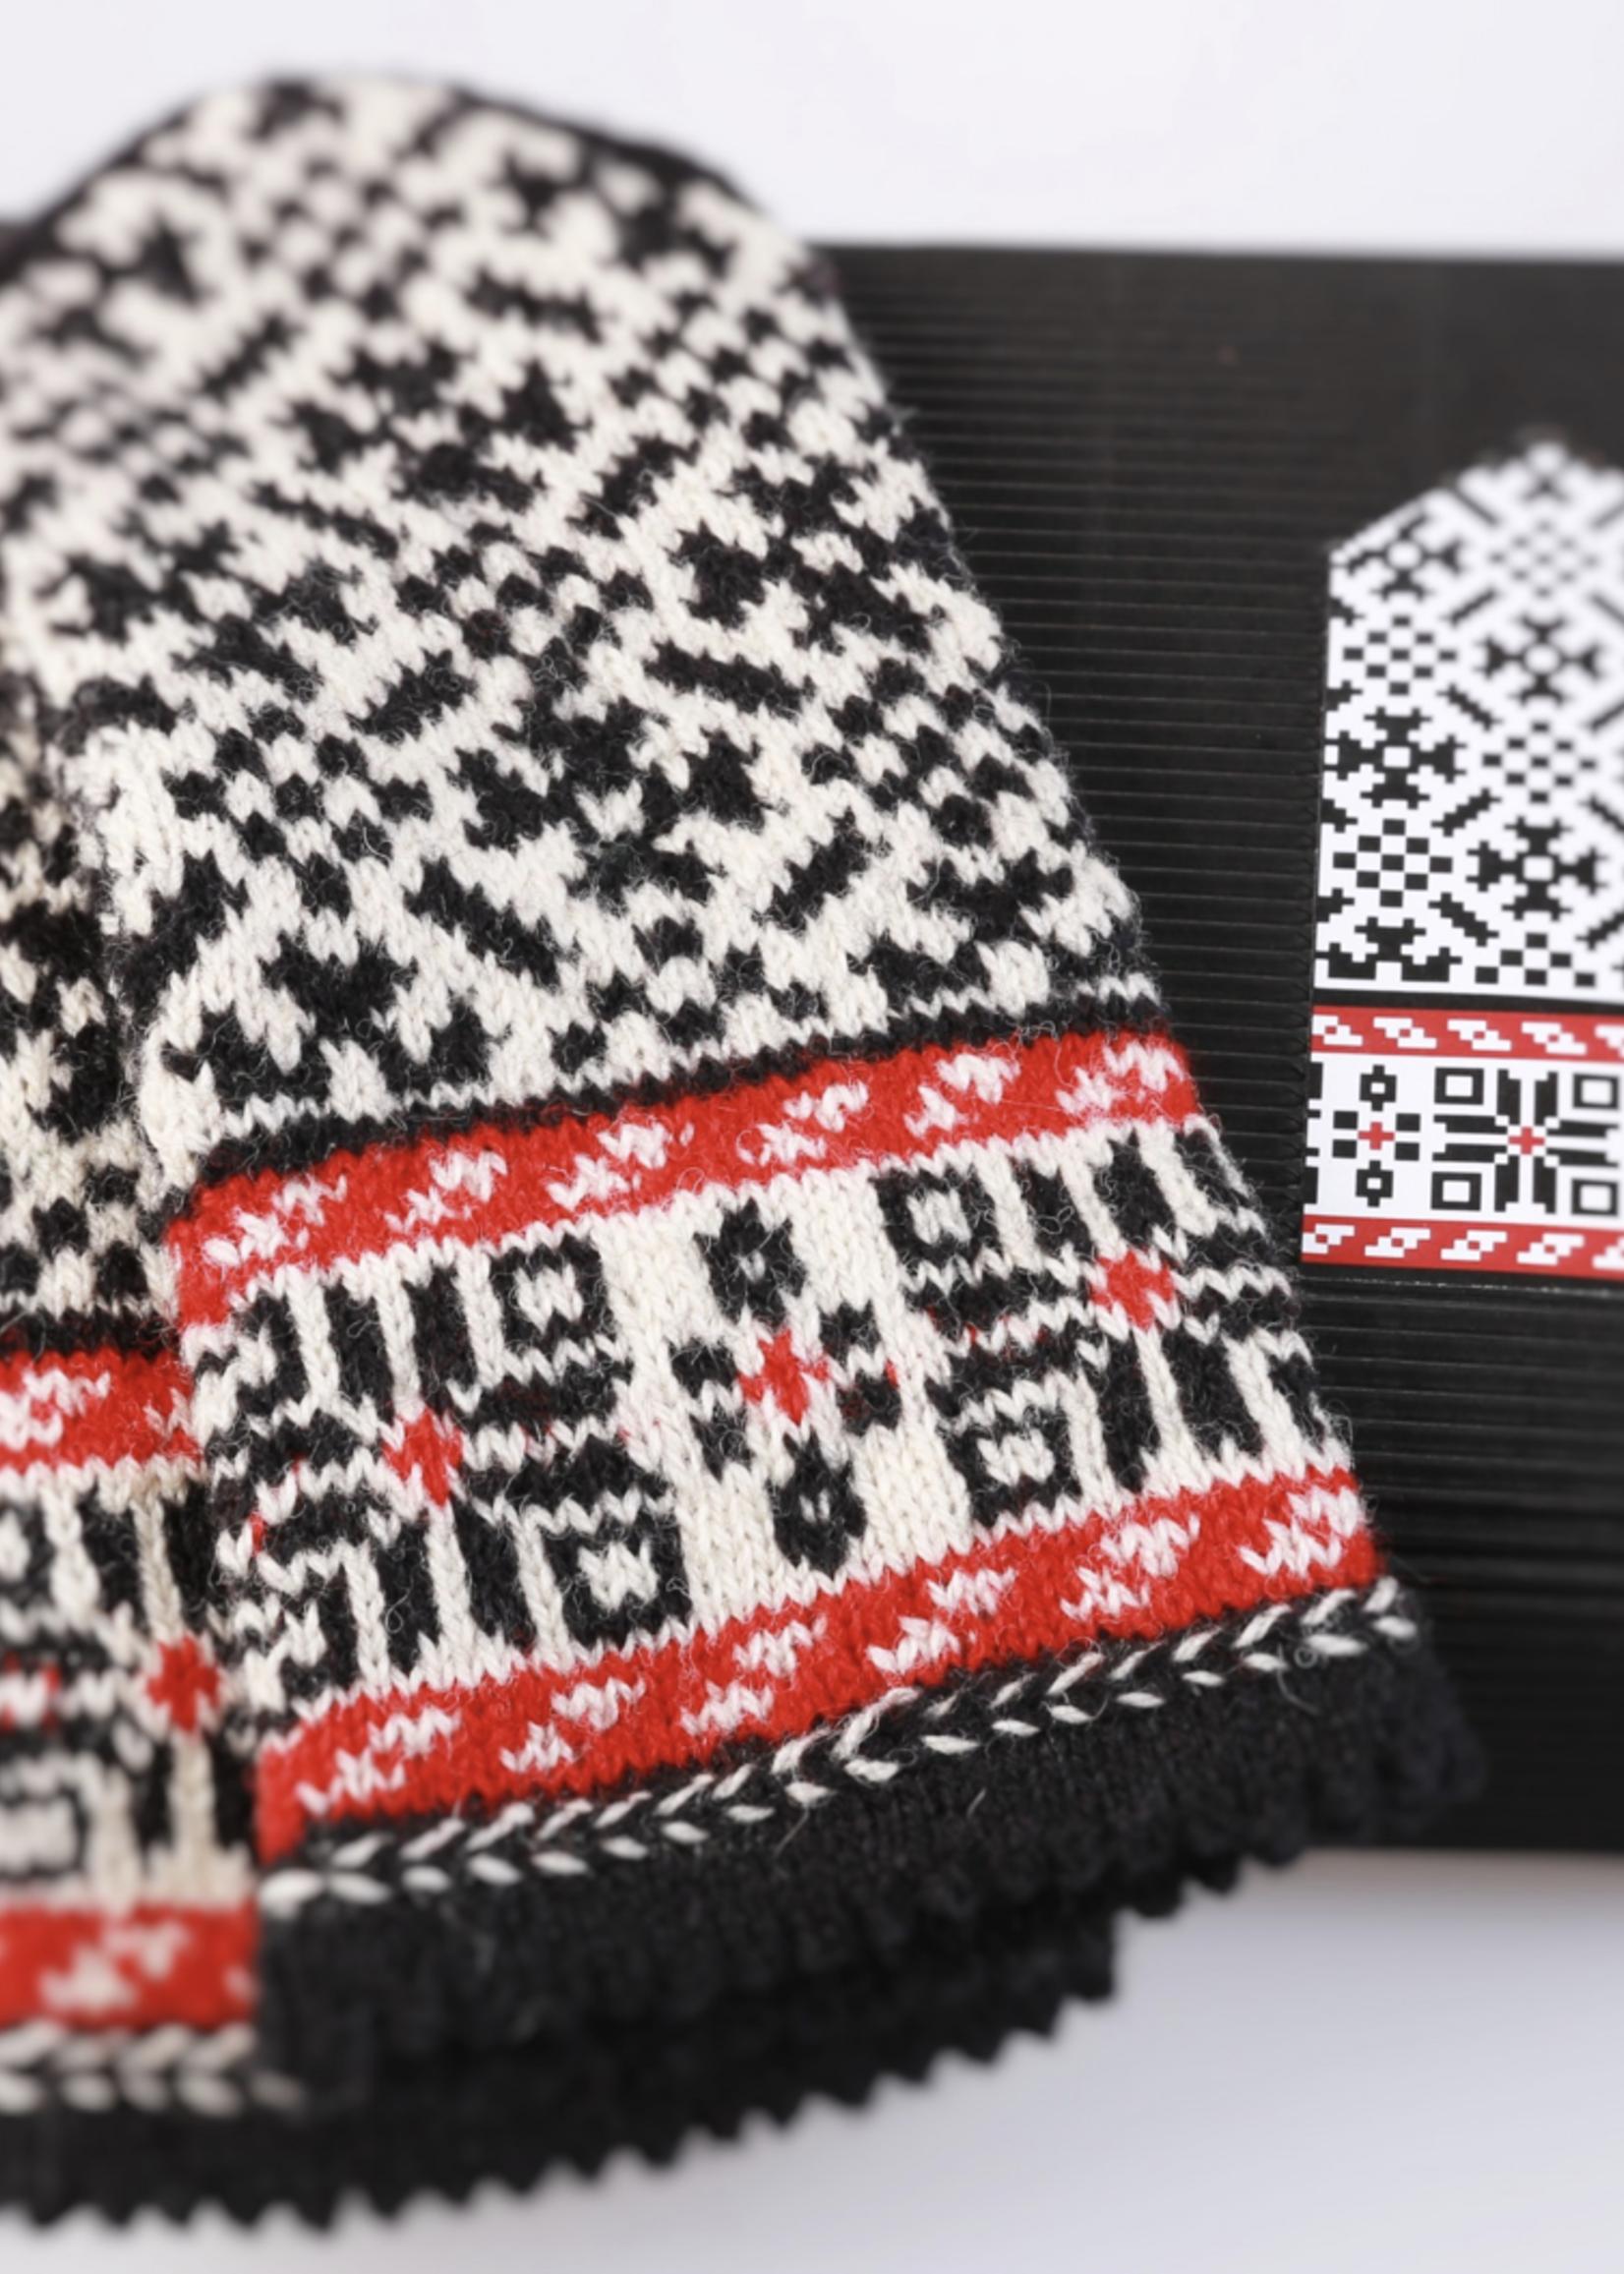 "Hobbywool Hobbywool Mittens Knitting Kit ""Latvian Gray"" No.11"